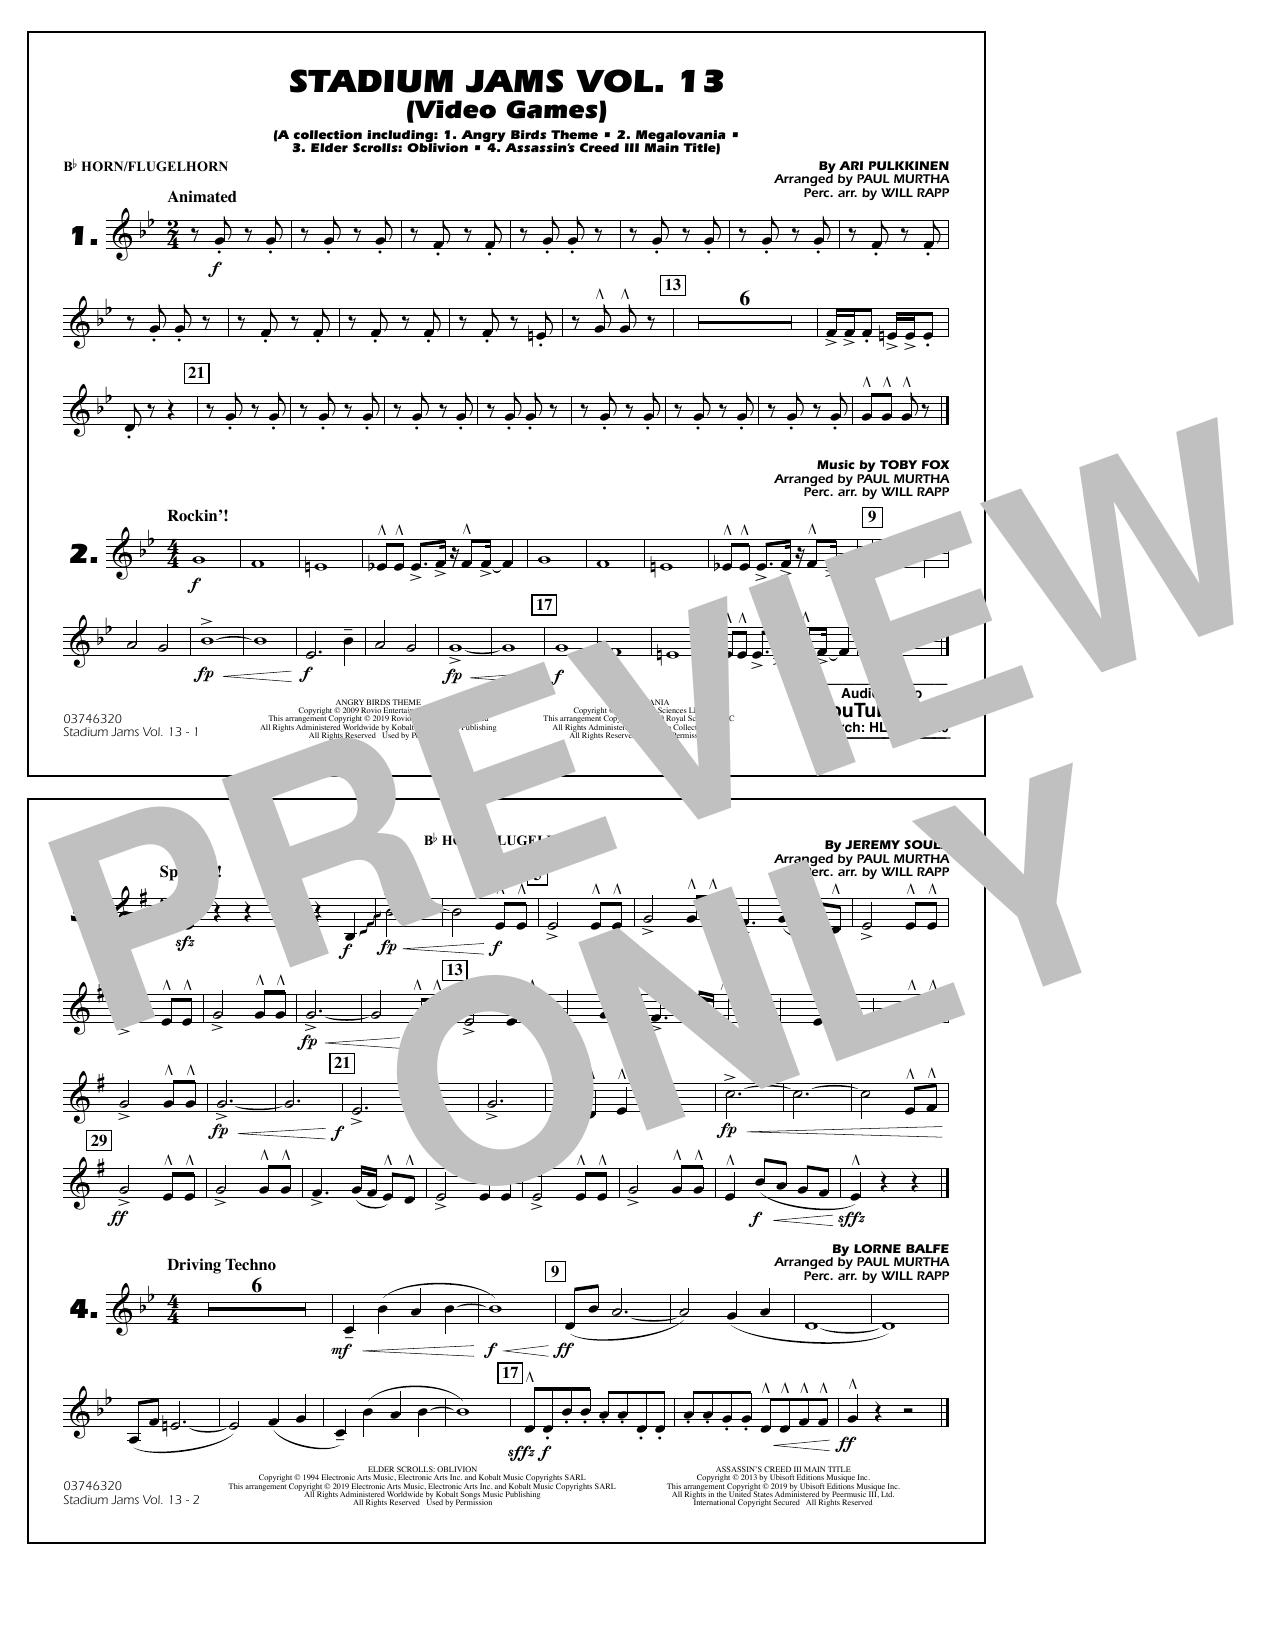 Stadium Jams Volume 13 (Video Games) - Bb Horn/Flugelhorn (Marching Band)